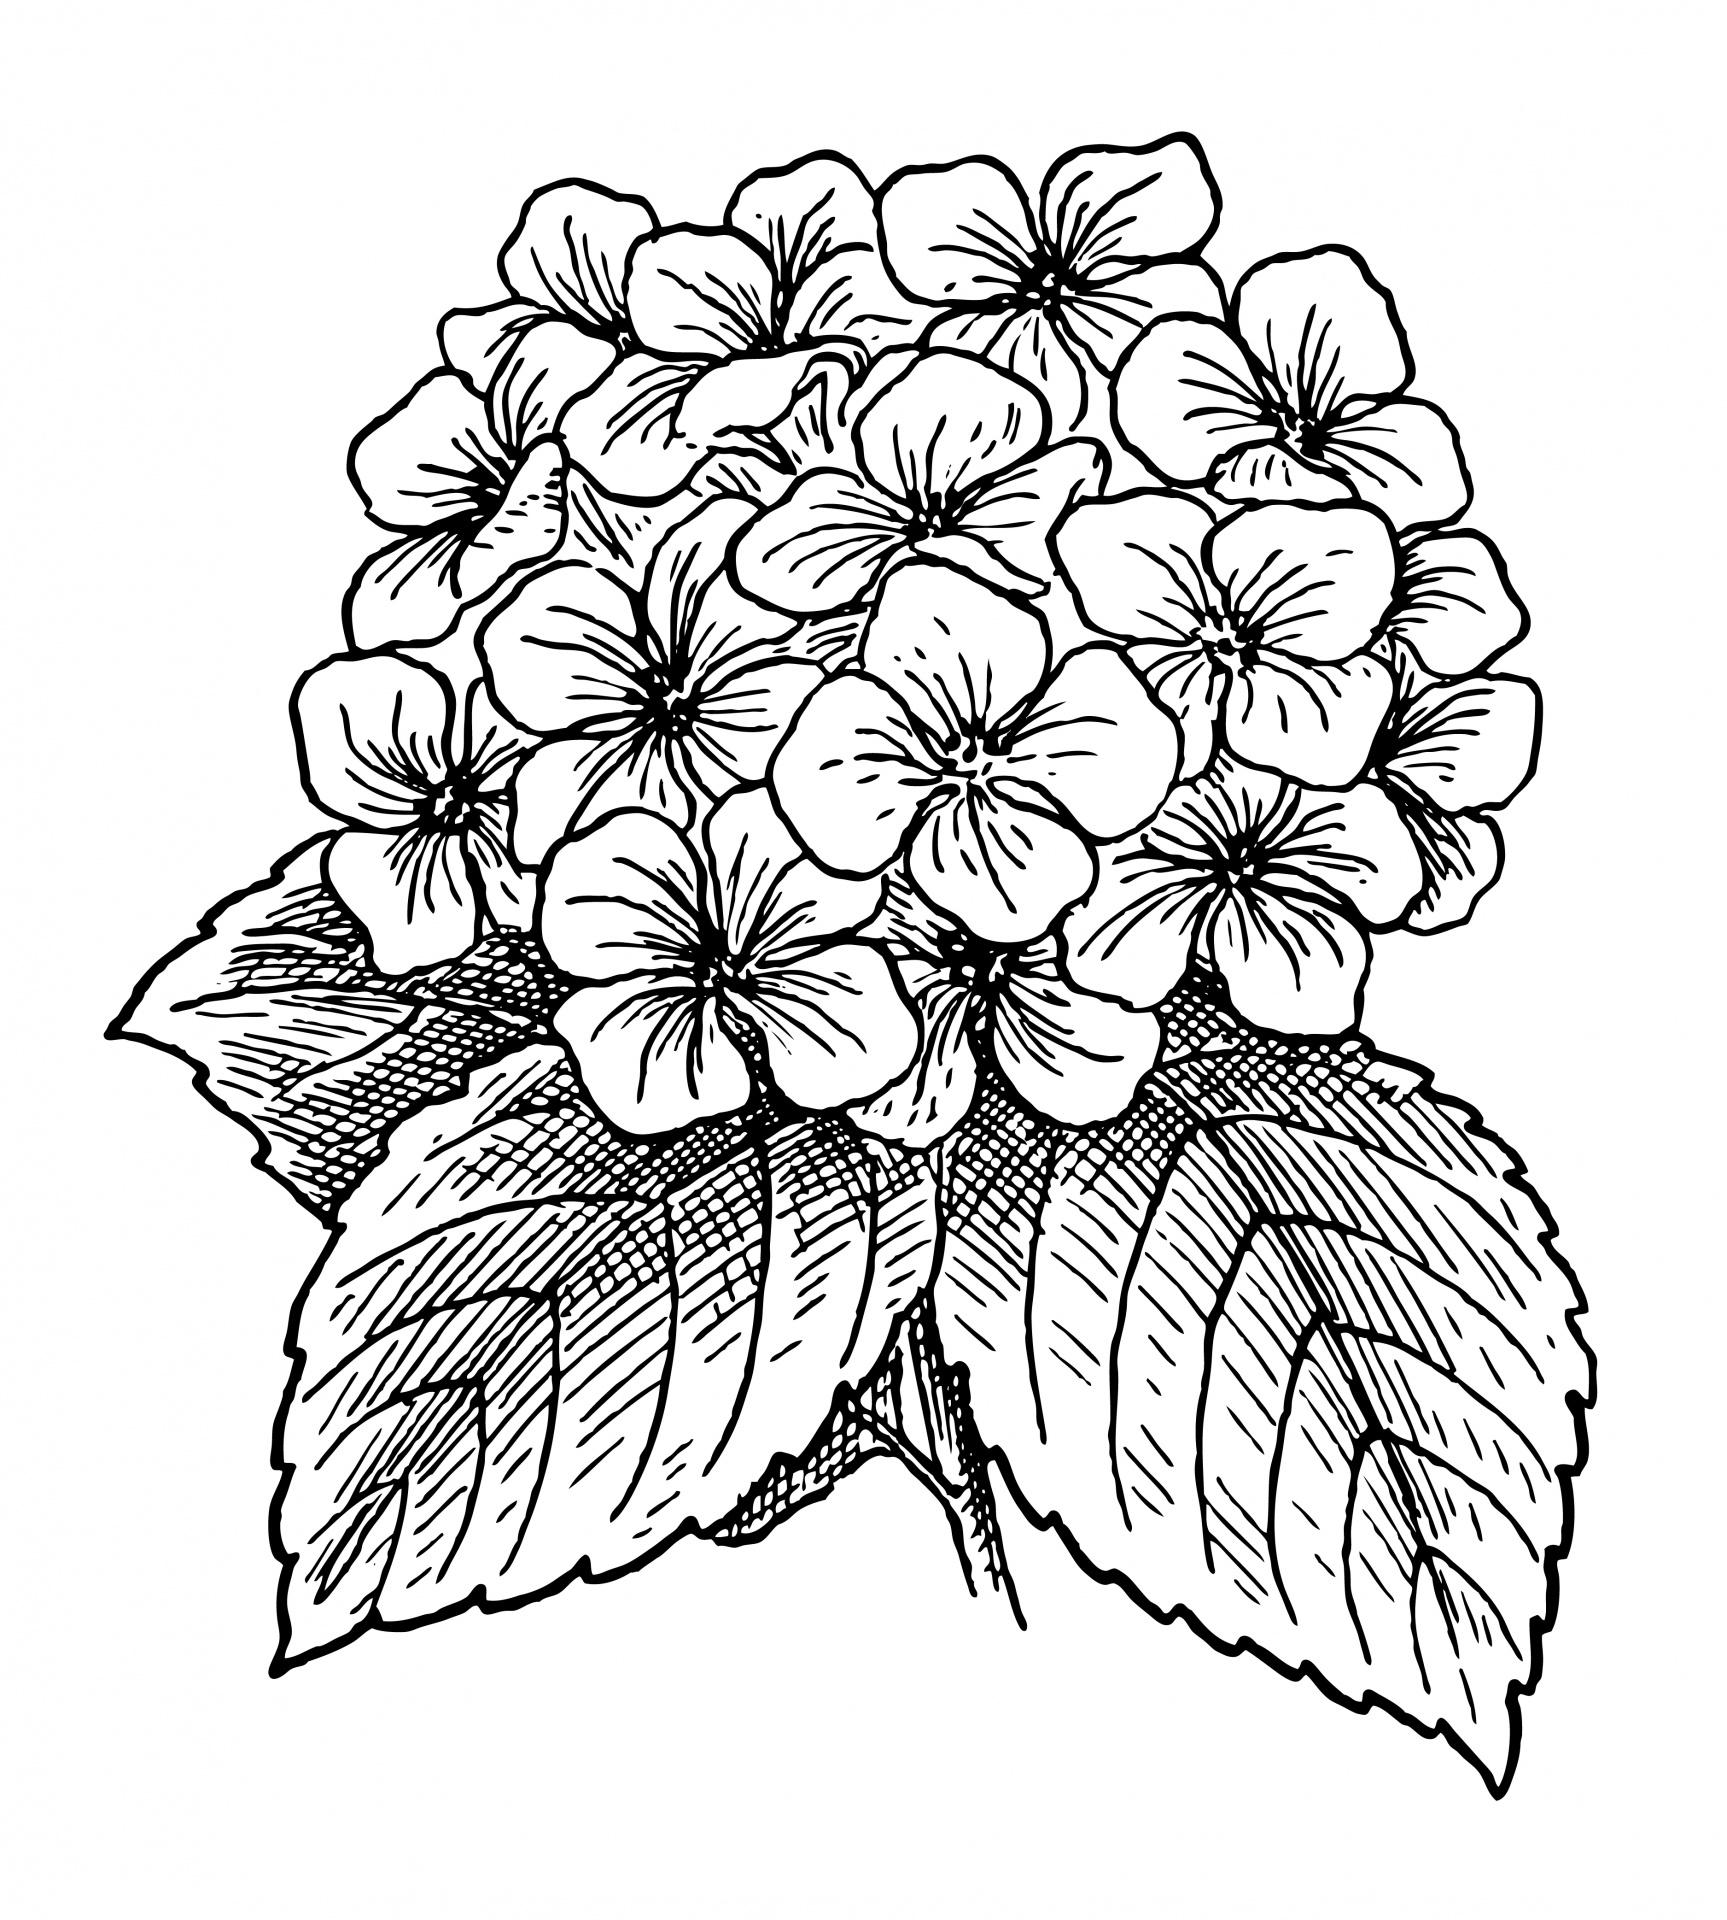 Flowers free stock photo. Hydrangea clipart